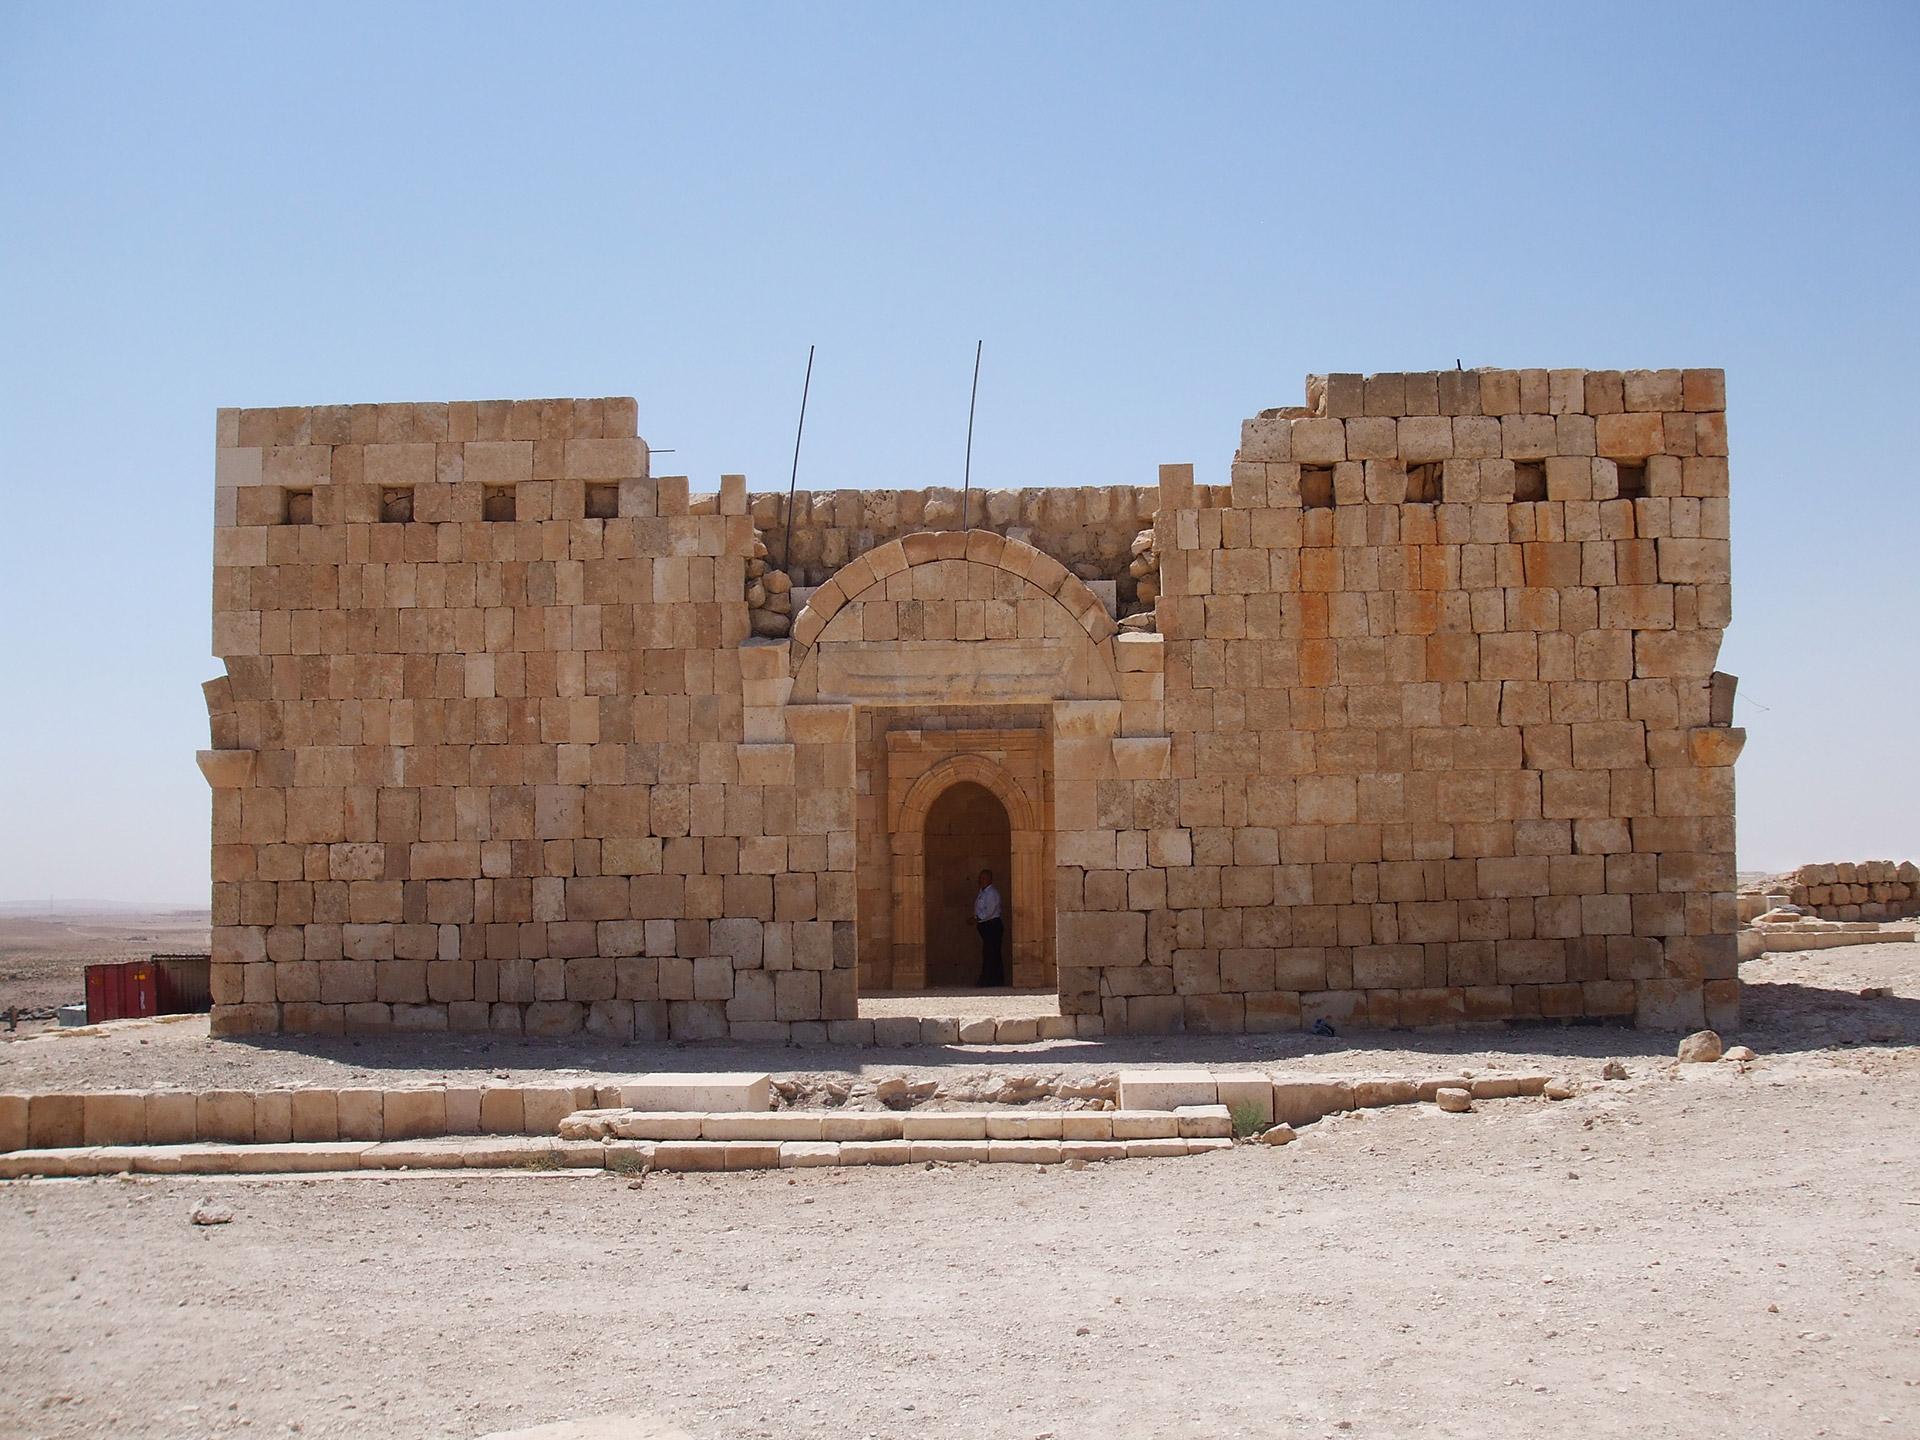 Wüstenschloss qasr al-hallabat